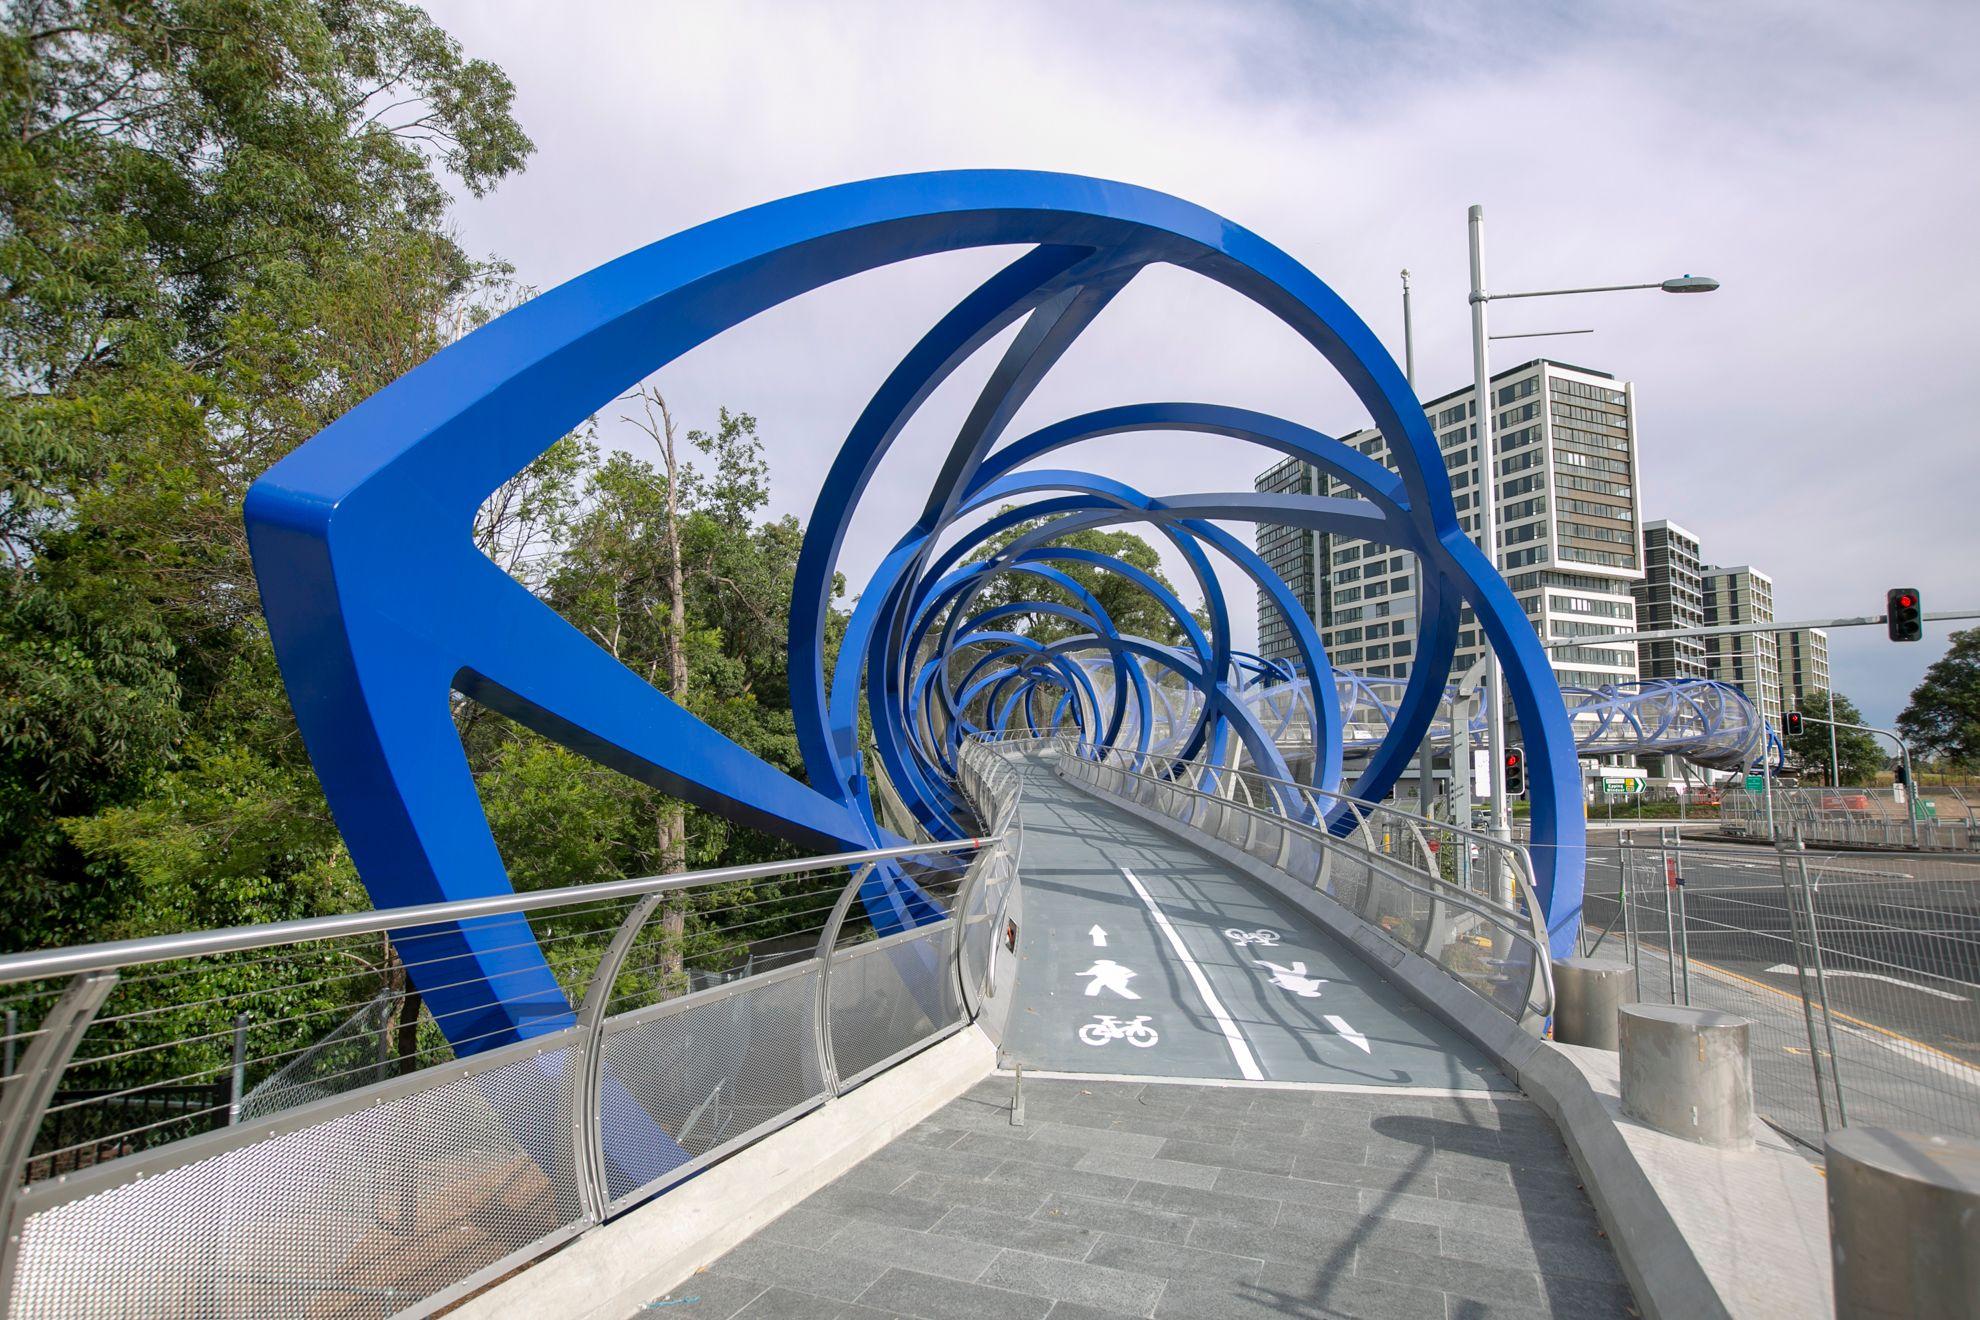 Australia's First Double Helix Bridge Opens in Sydney